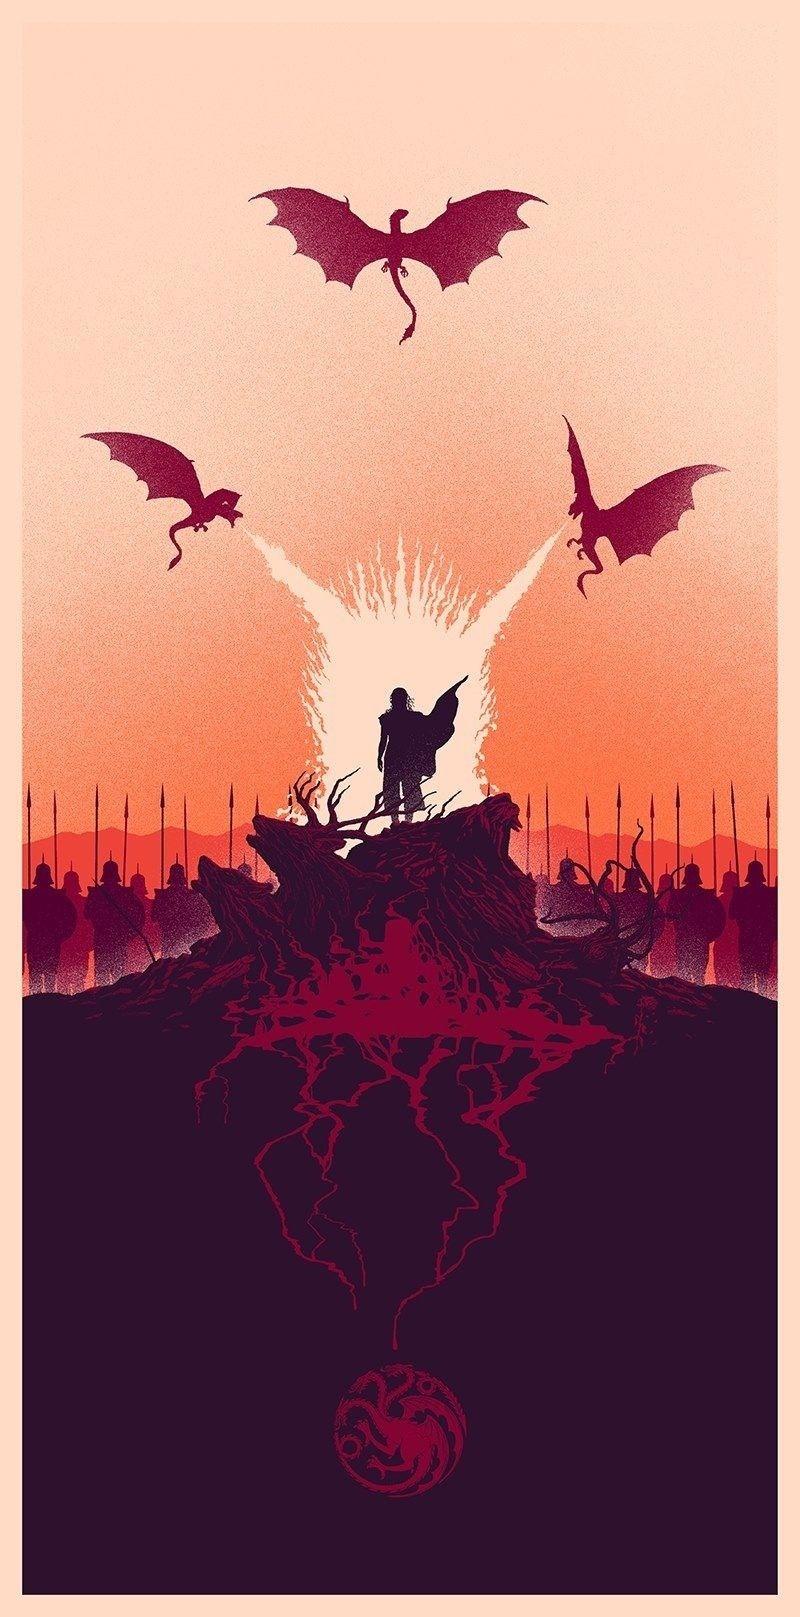 Free Download 50 Lo Mejor De Game Of Thrones Imgenes Taringa Dany